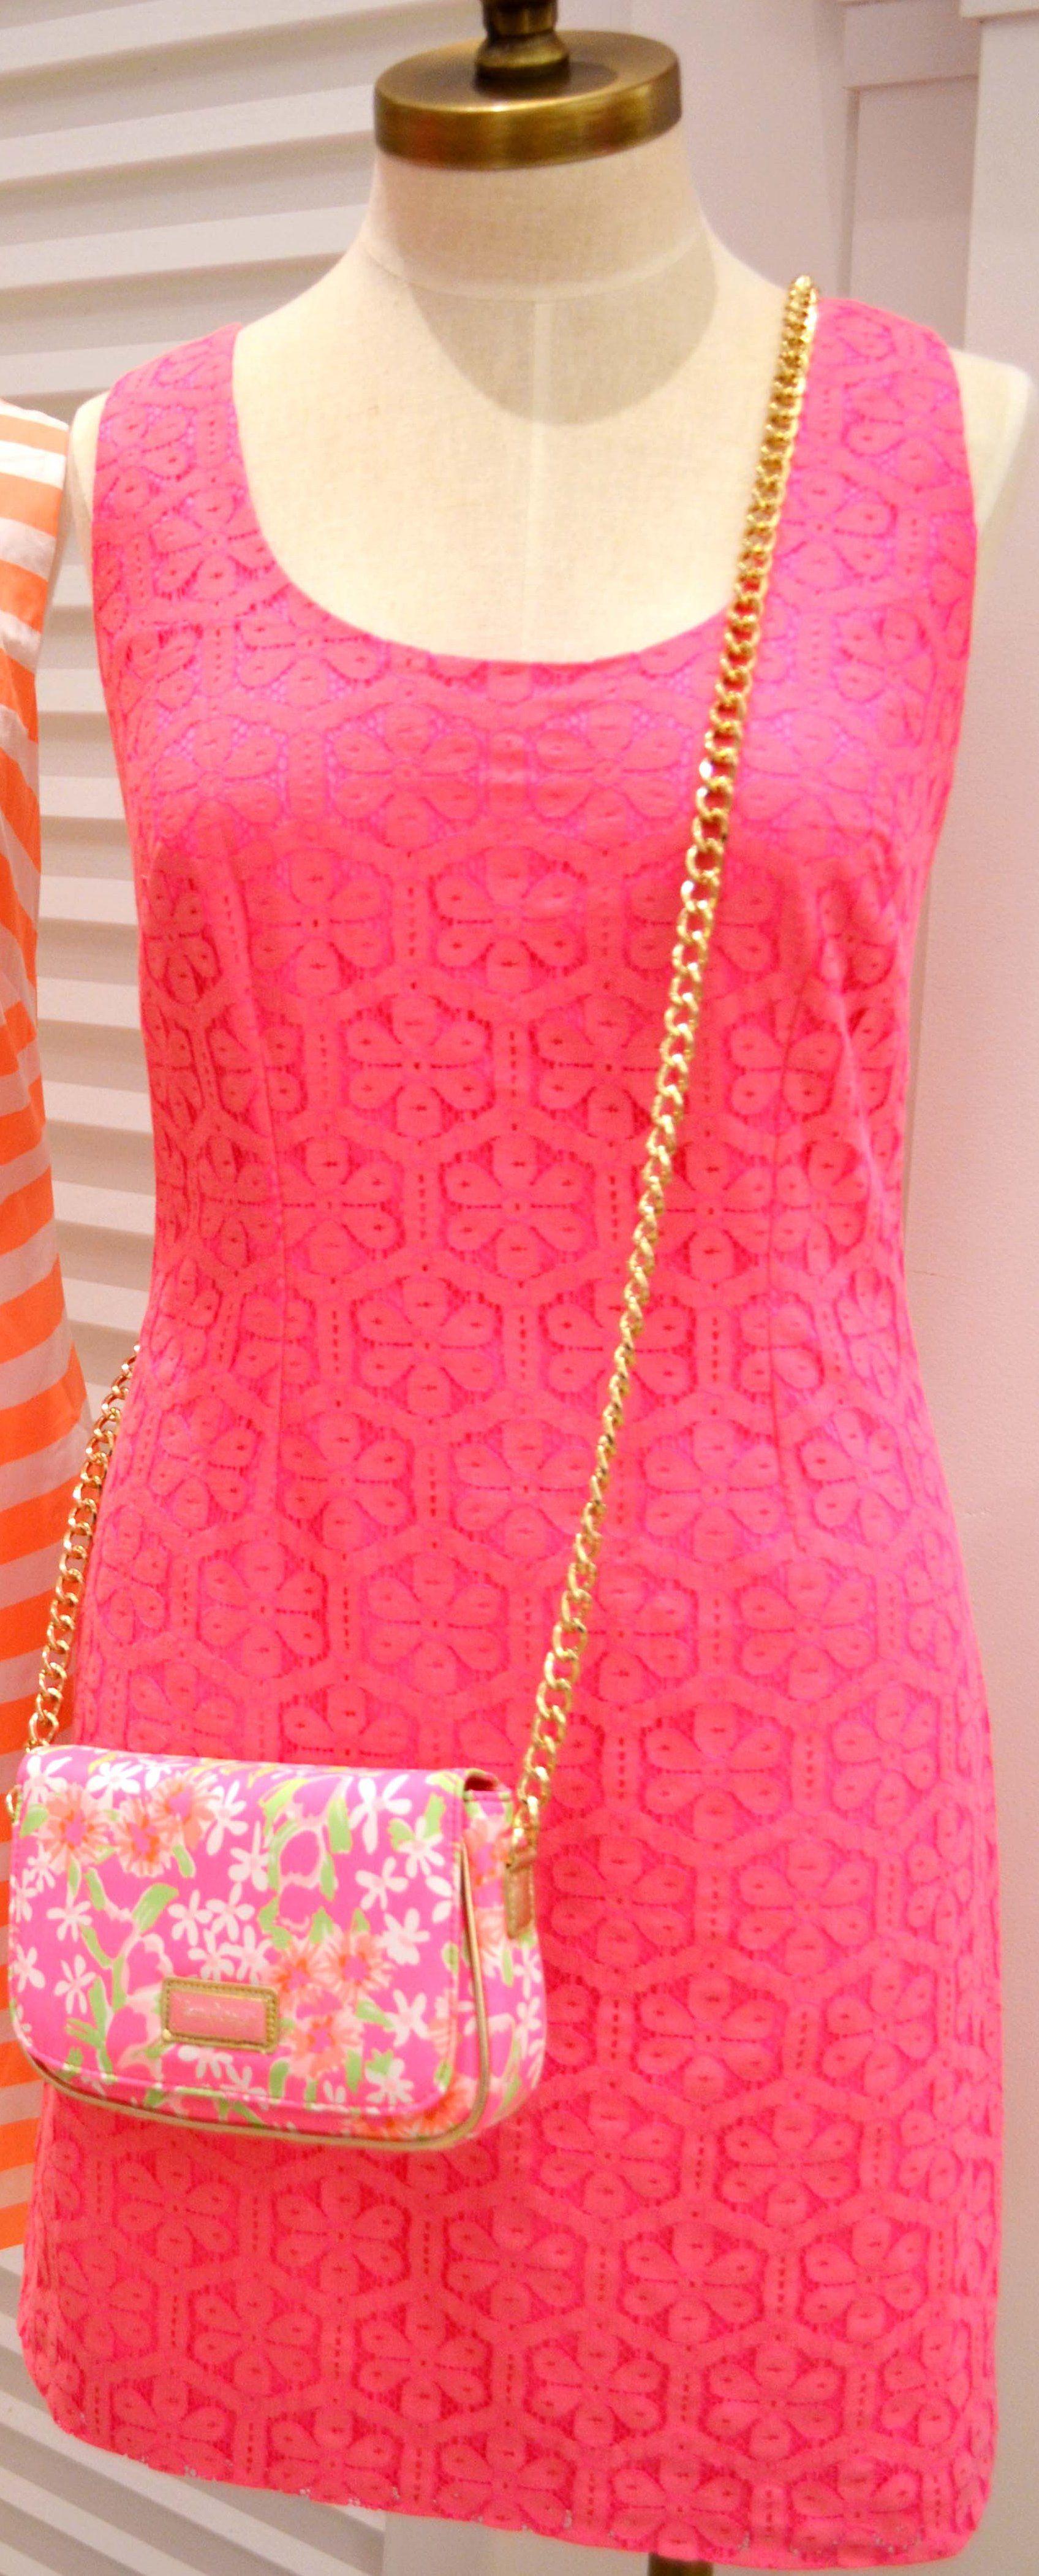 Lilly Pulitzer Spring \'13- Lonnie Dress in Fiesta Pink Daisy Lane ...